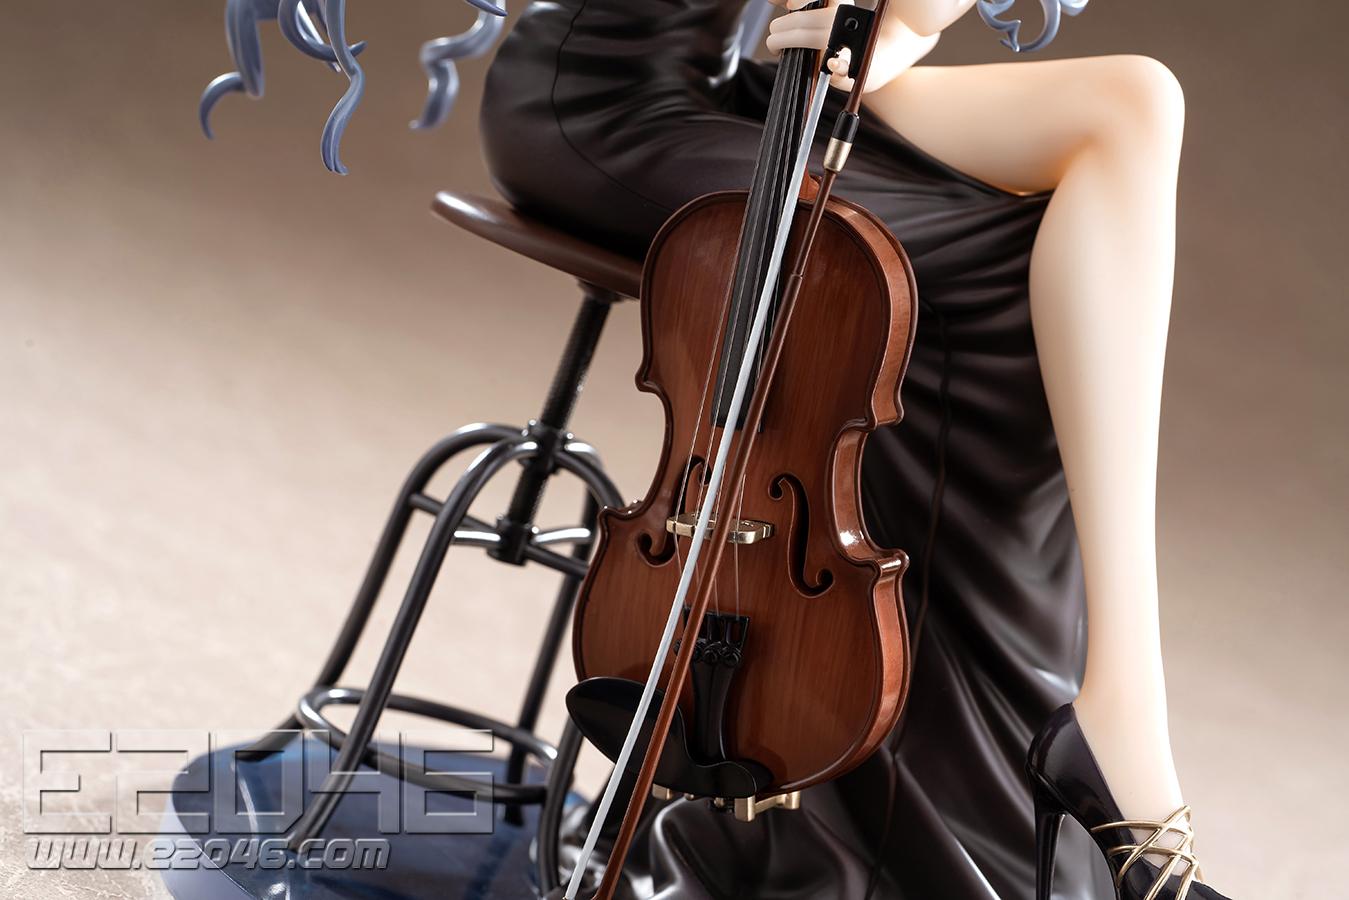 AK-12 Orchestra Concert Version (PVC)